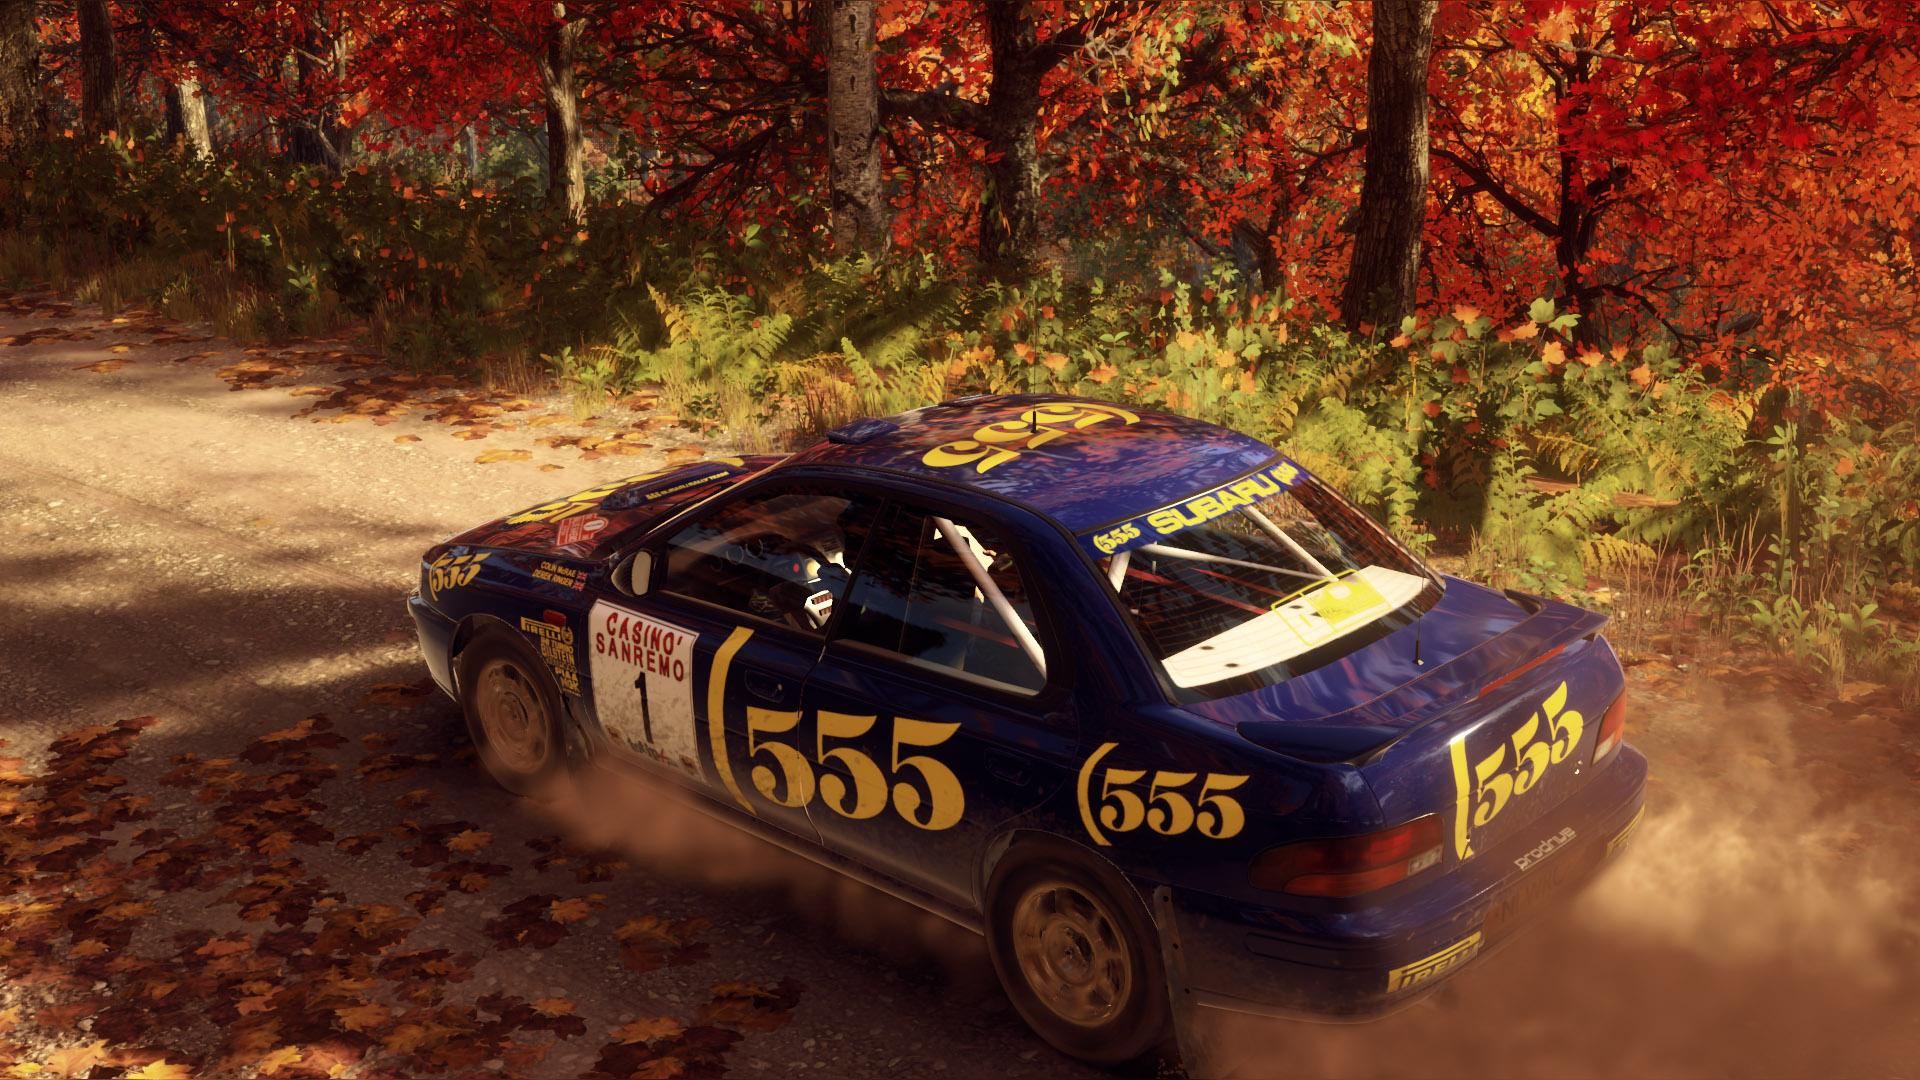 Subaru_Impreza_1996_06.jpg